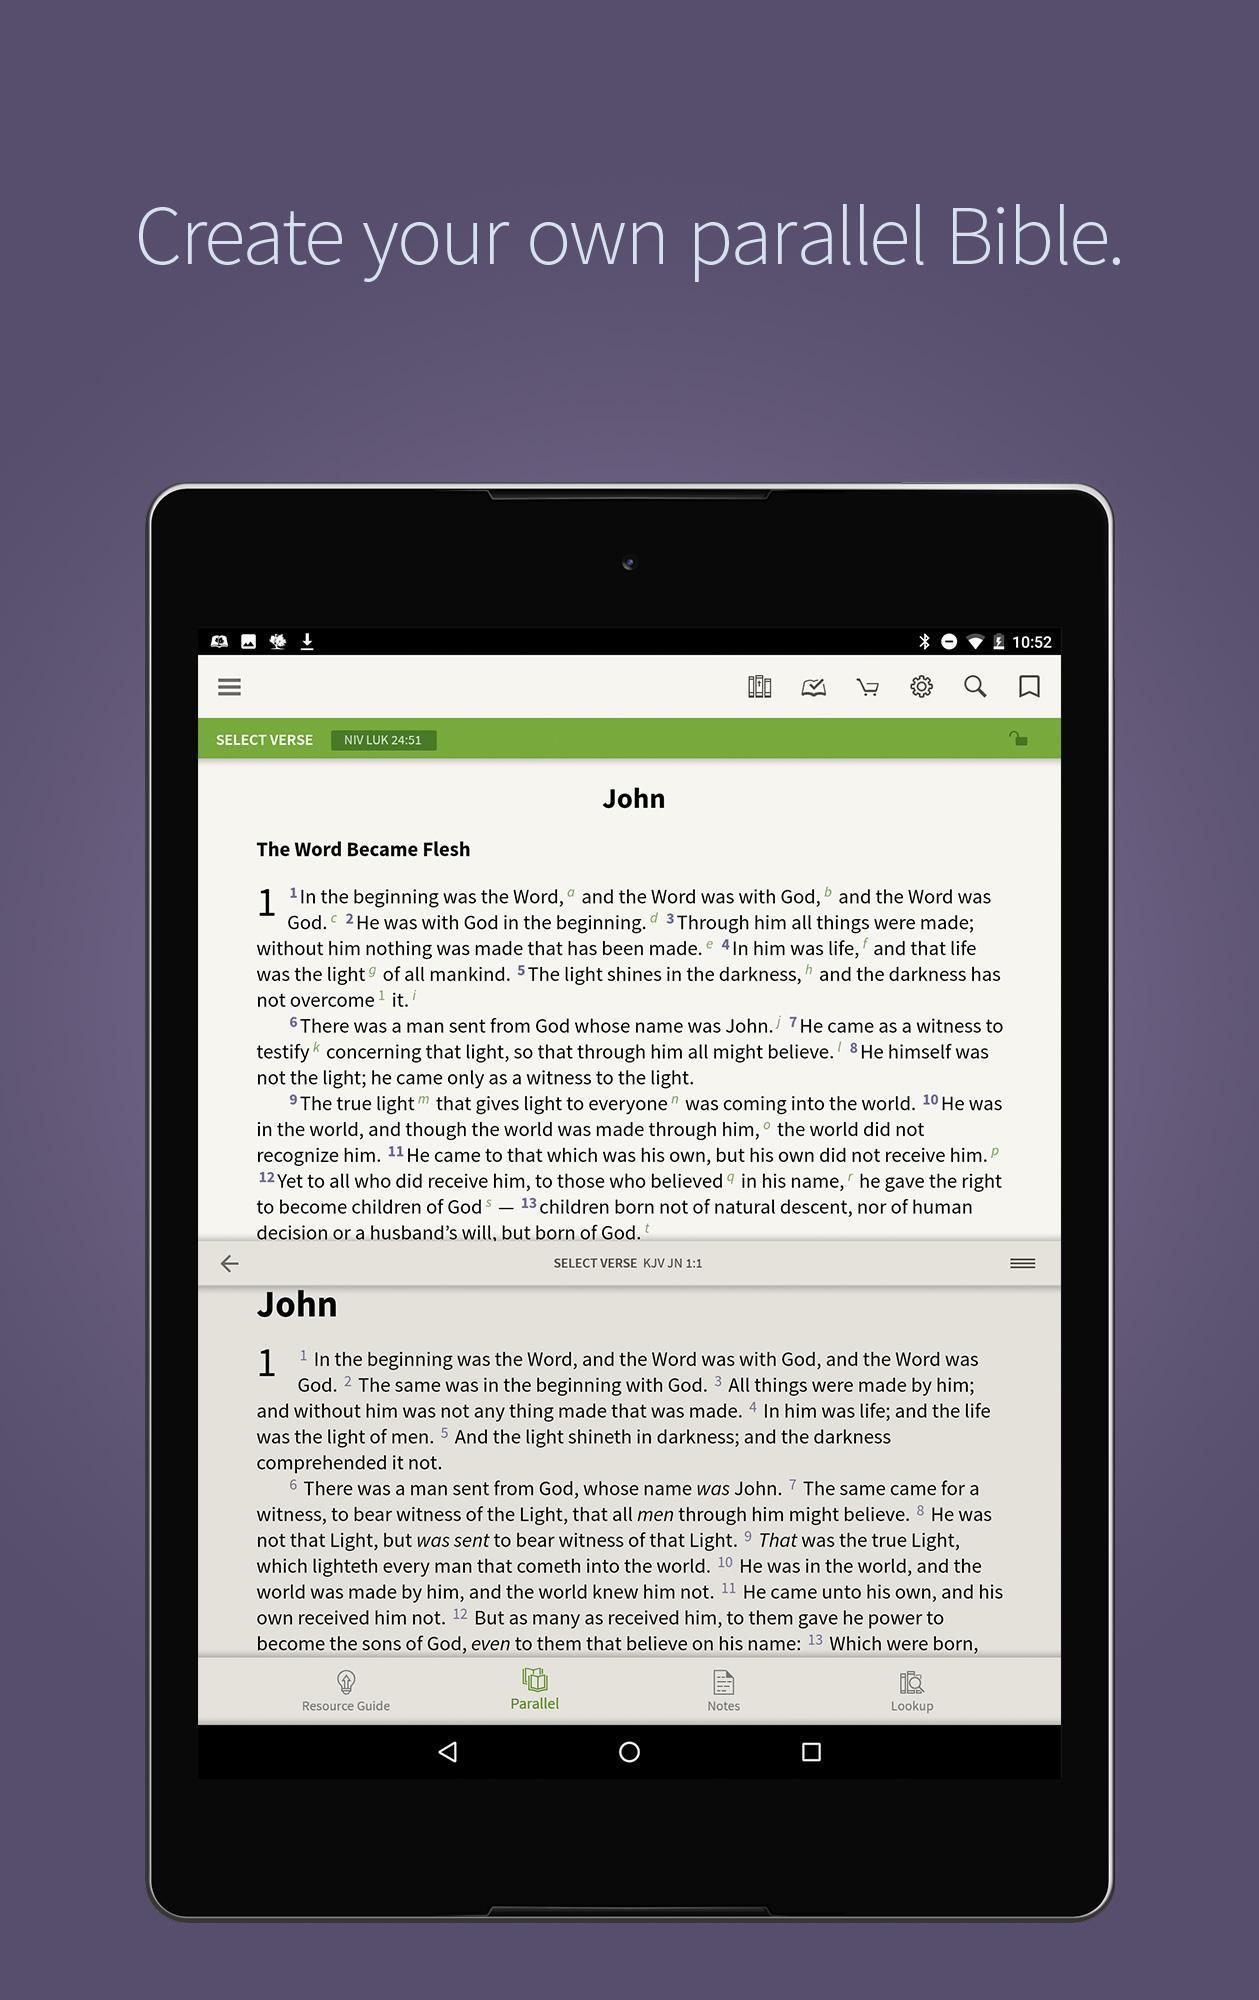 Bible App by Olive Tree 7.5.4.0.5664 Screenshot 22